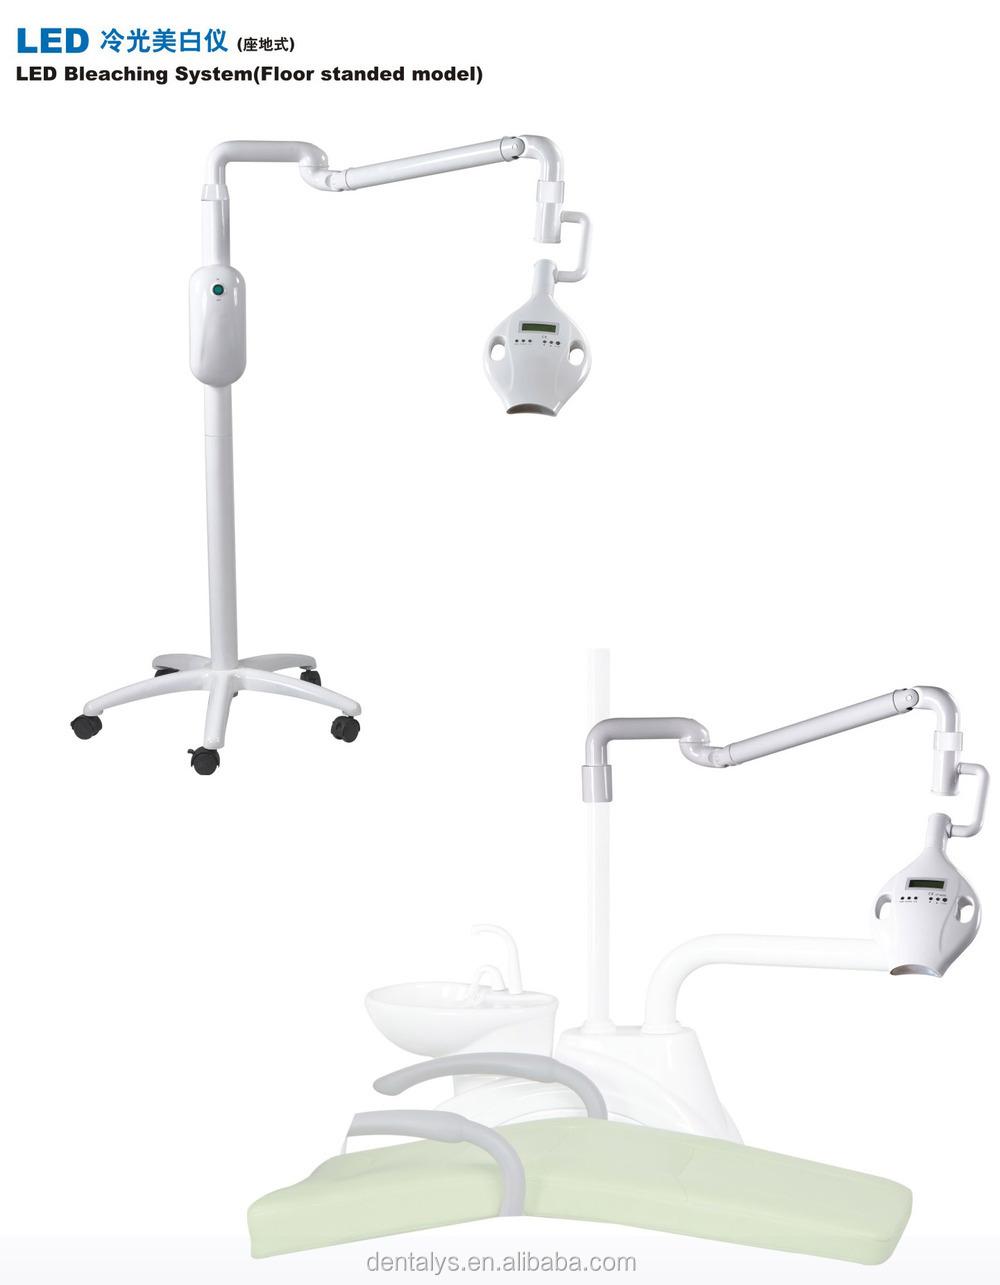 machine Au Dents Blanchiment En Des Buy Machine De Laser Led Lampe Gros Laser Dentszoom N0ymO8vnw